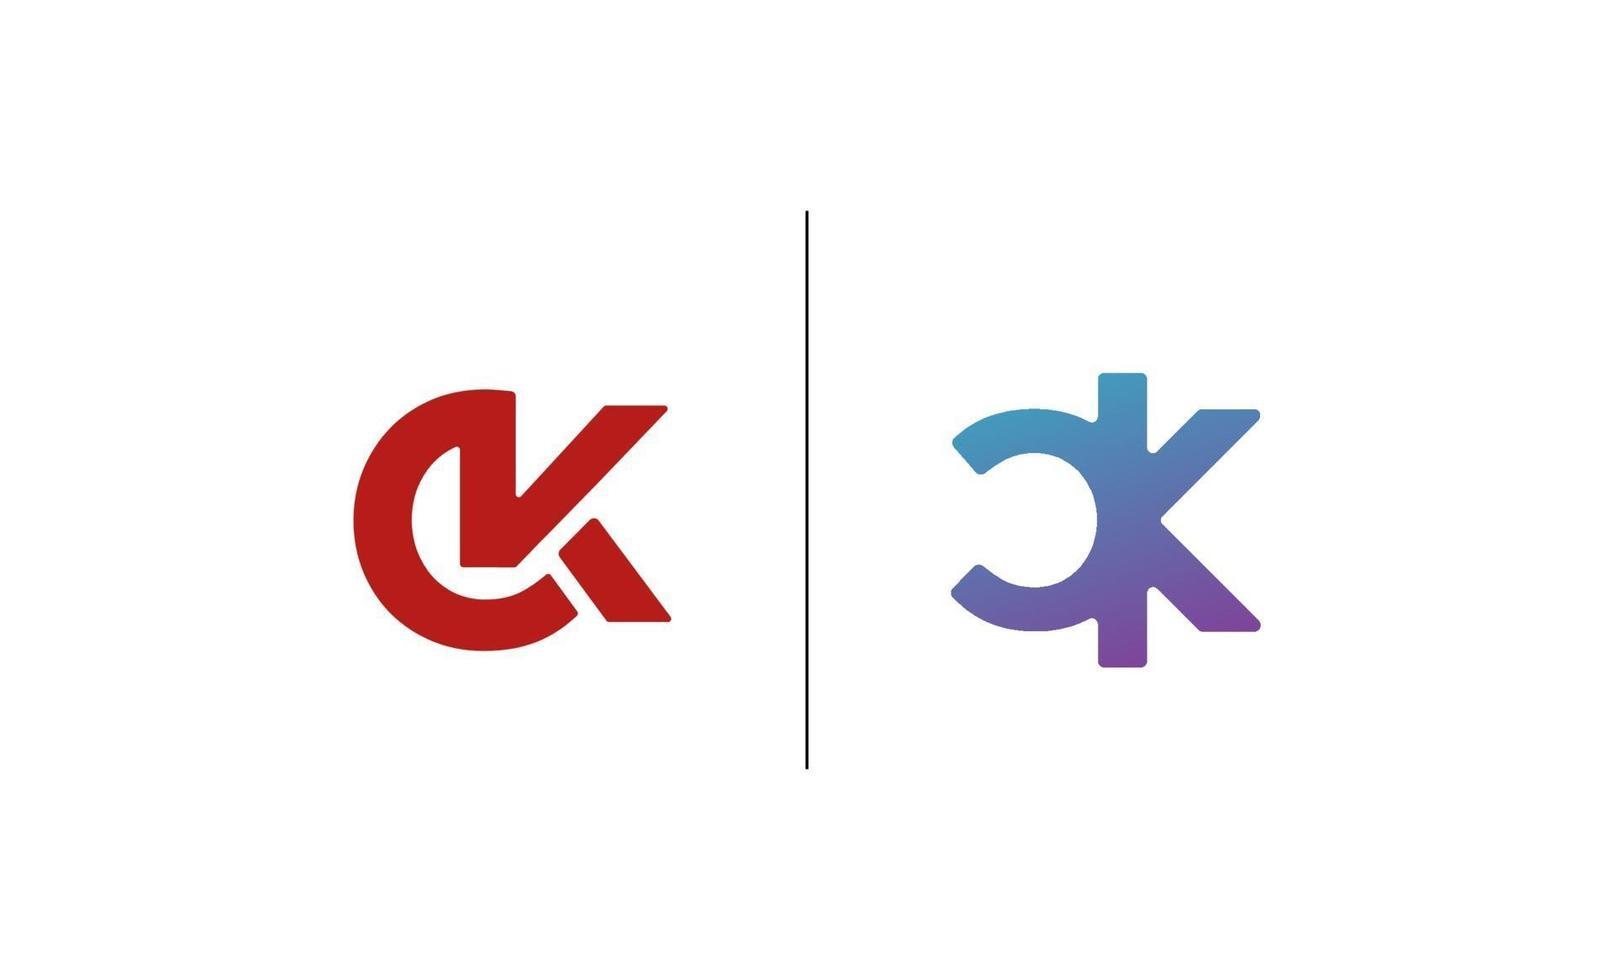 vector de plantilla de diseño de logotipo de ck inicial, kc